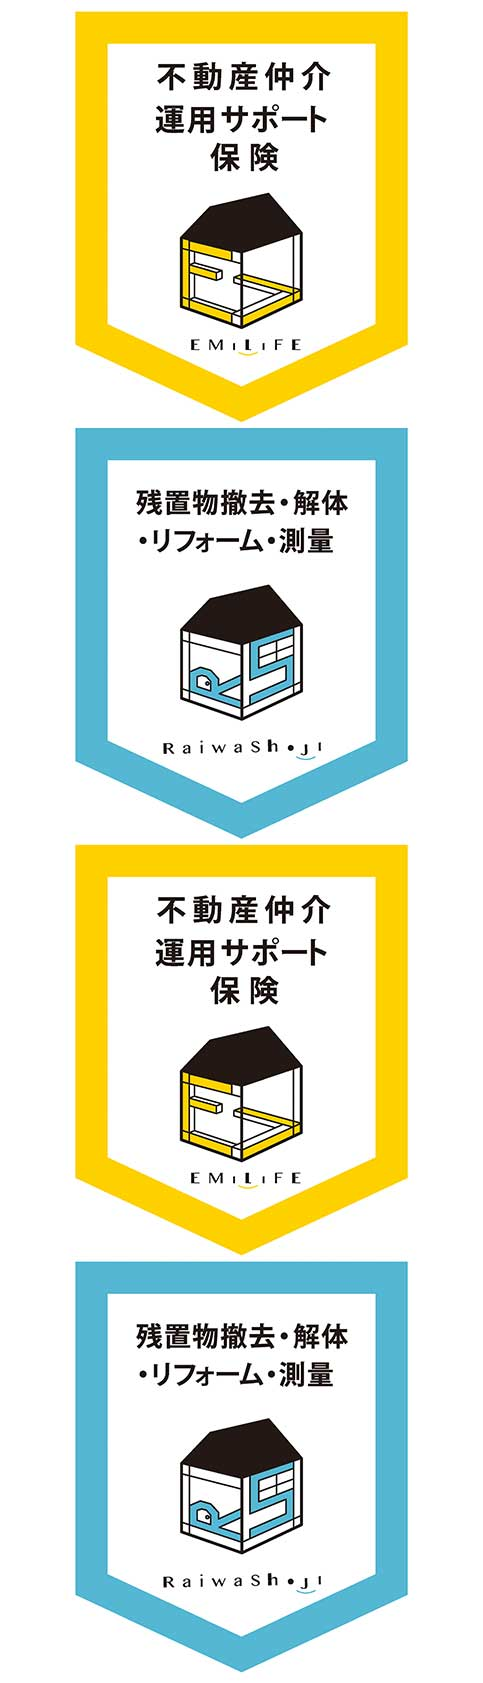 img_branding02